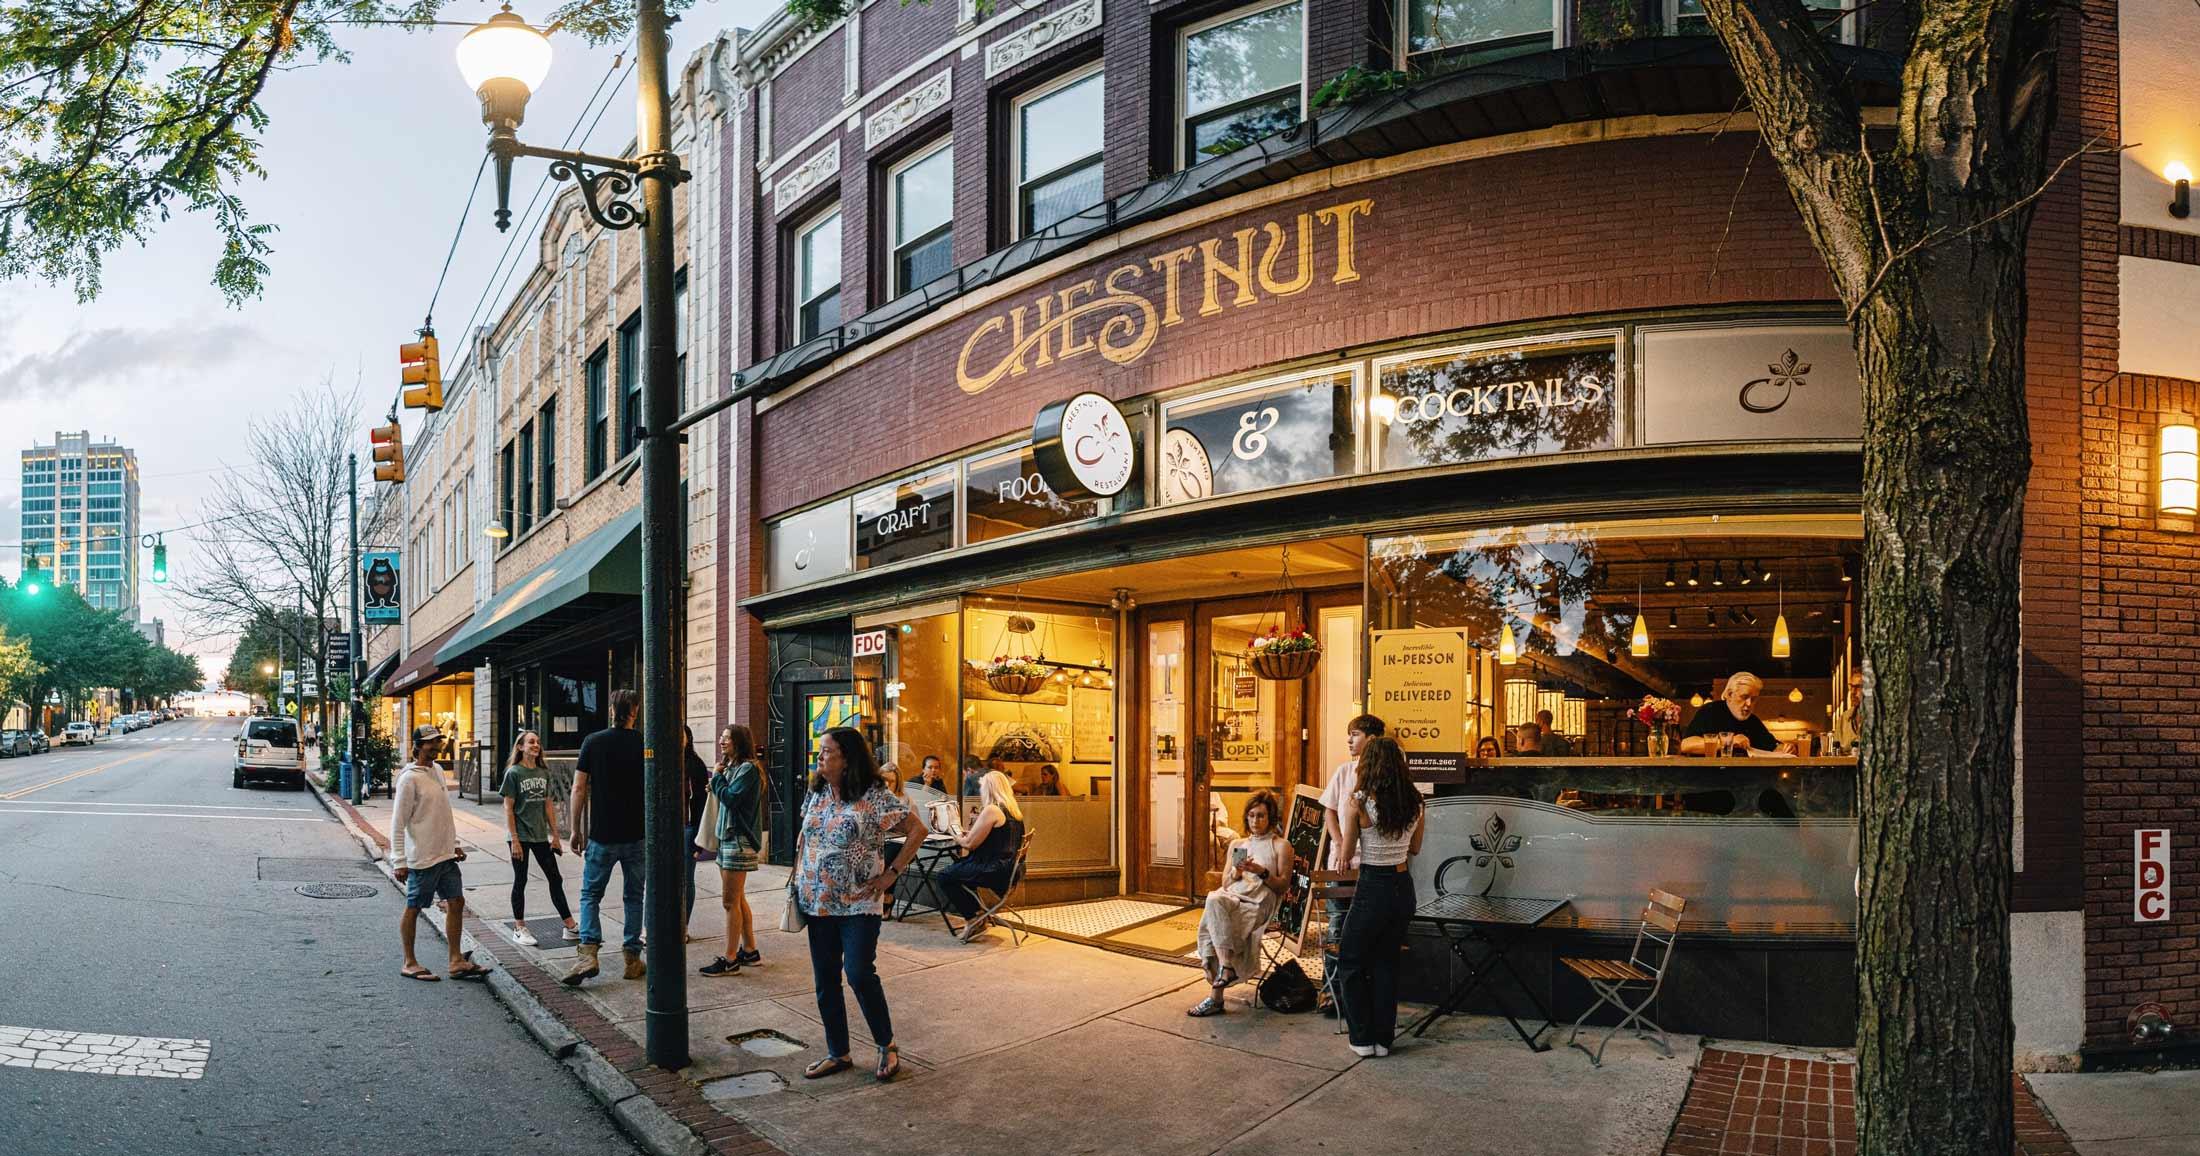 Chestnut facade redesign